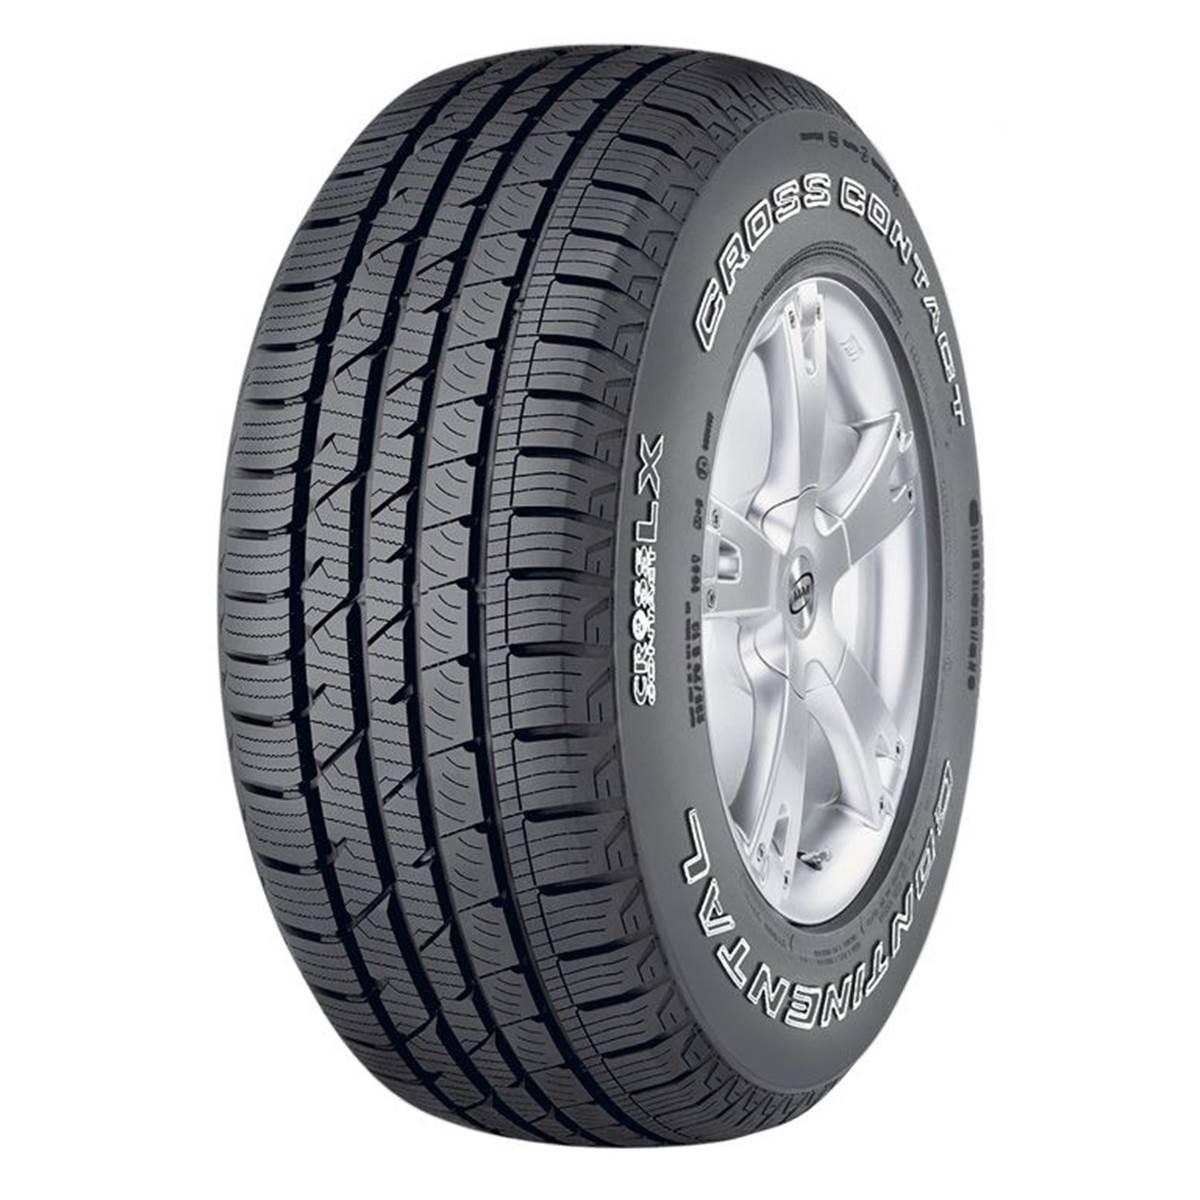 achat pneu continental conti crosscontact lx sport 225 60 r17 99h pas cher. Black Bedroom Furniture Sets. Home Design Ideas